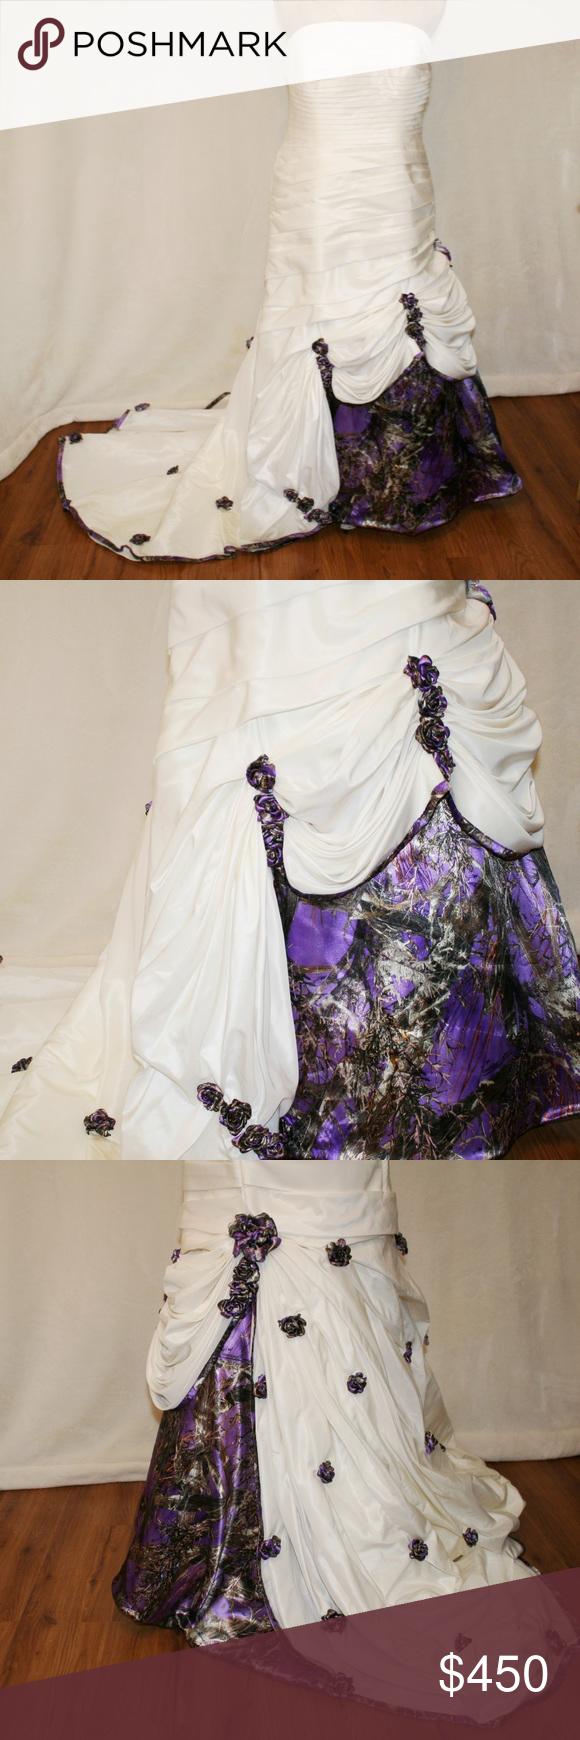 Sold Purple Camo Wedding Gown Bridal Dress Country Purple Camo Wedding Camo Wedding Purple Camo Wedding Dress [ 1740 x 580 Pixel ]